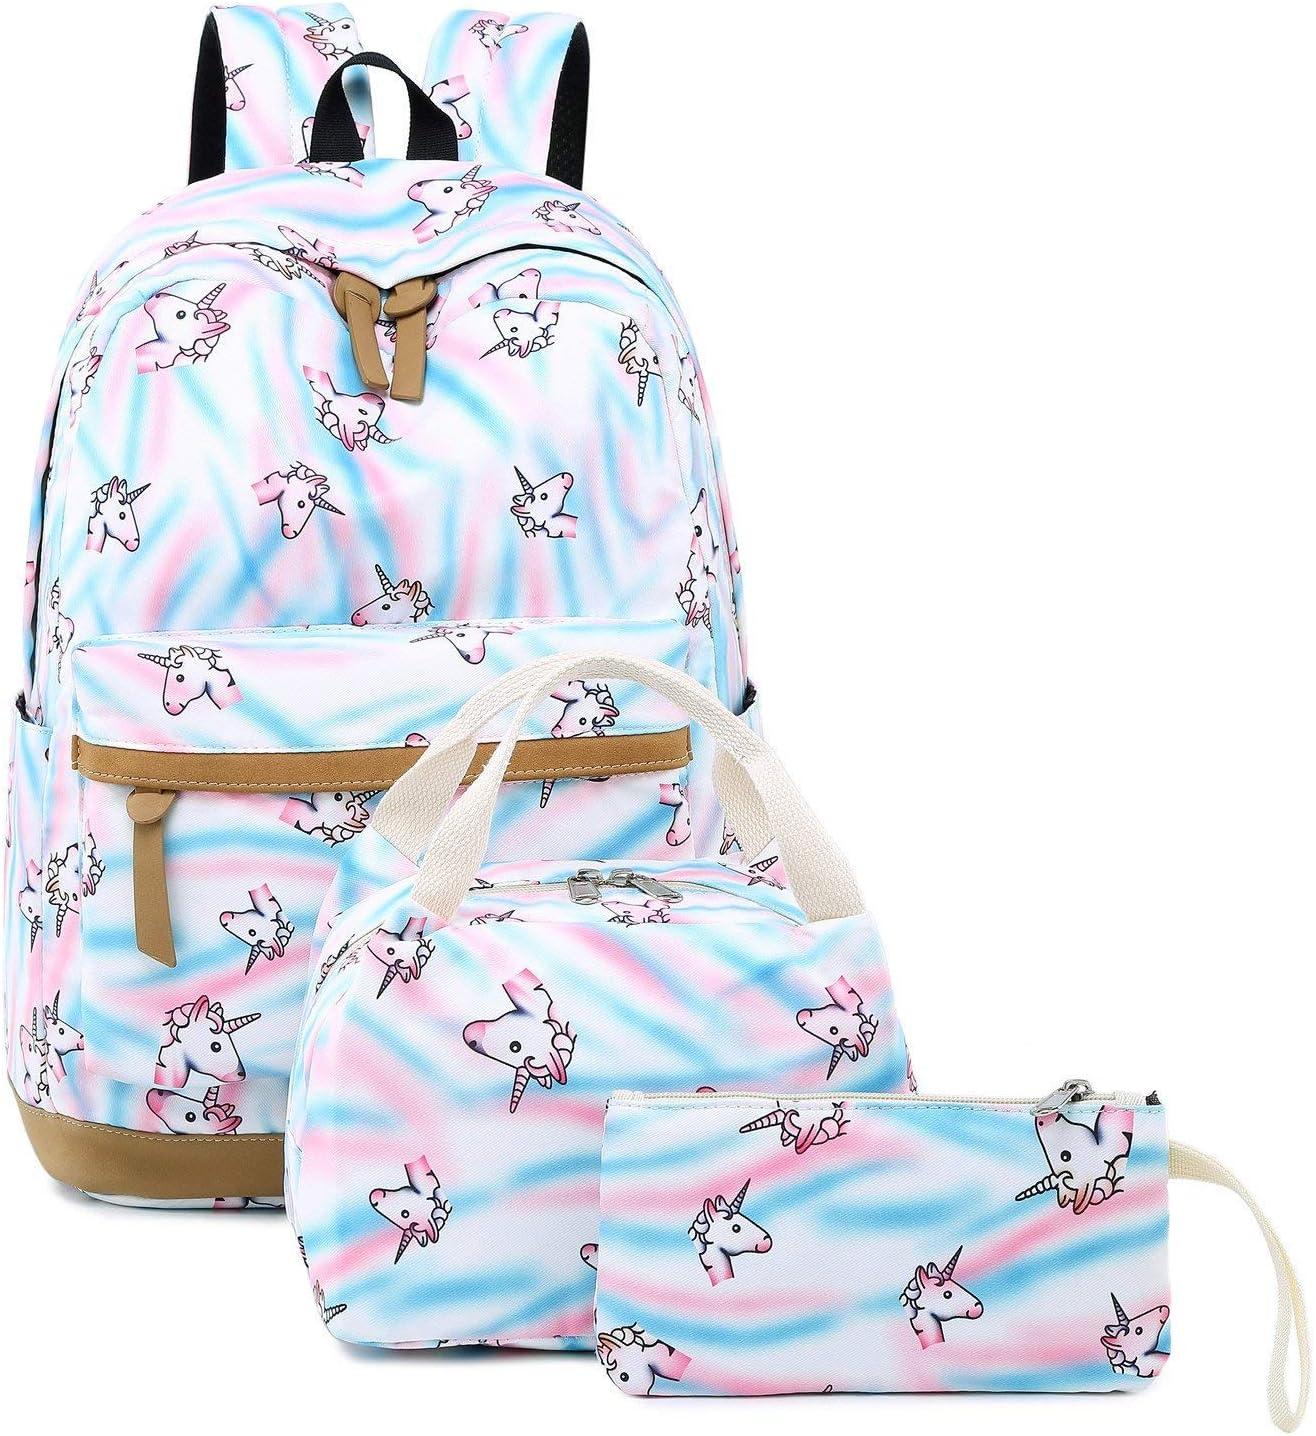 Girls Unicorn Backpacks Students School Bags Kids Bookbags Set Teens Shoulder Bags and Lunch Tote Bag Pencil Case (Unicorn Set)